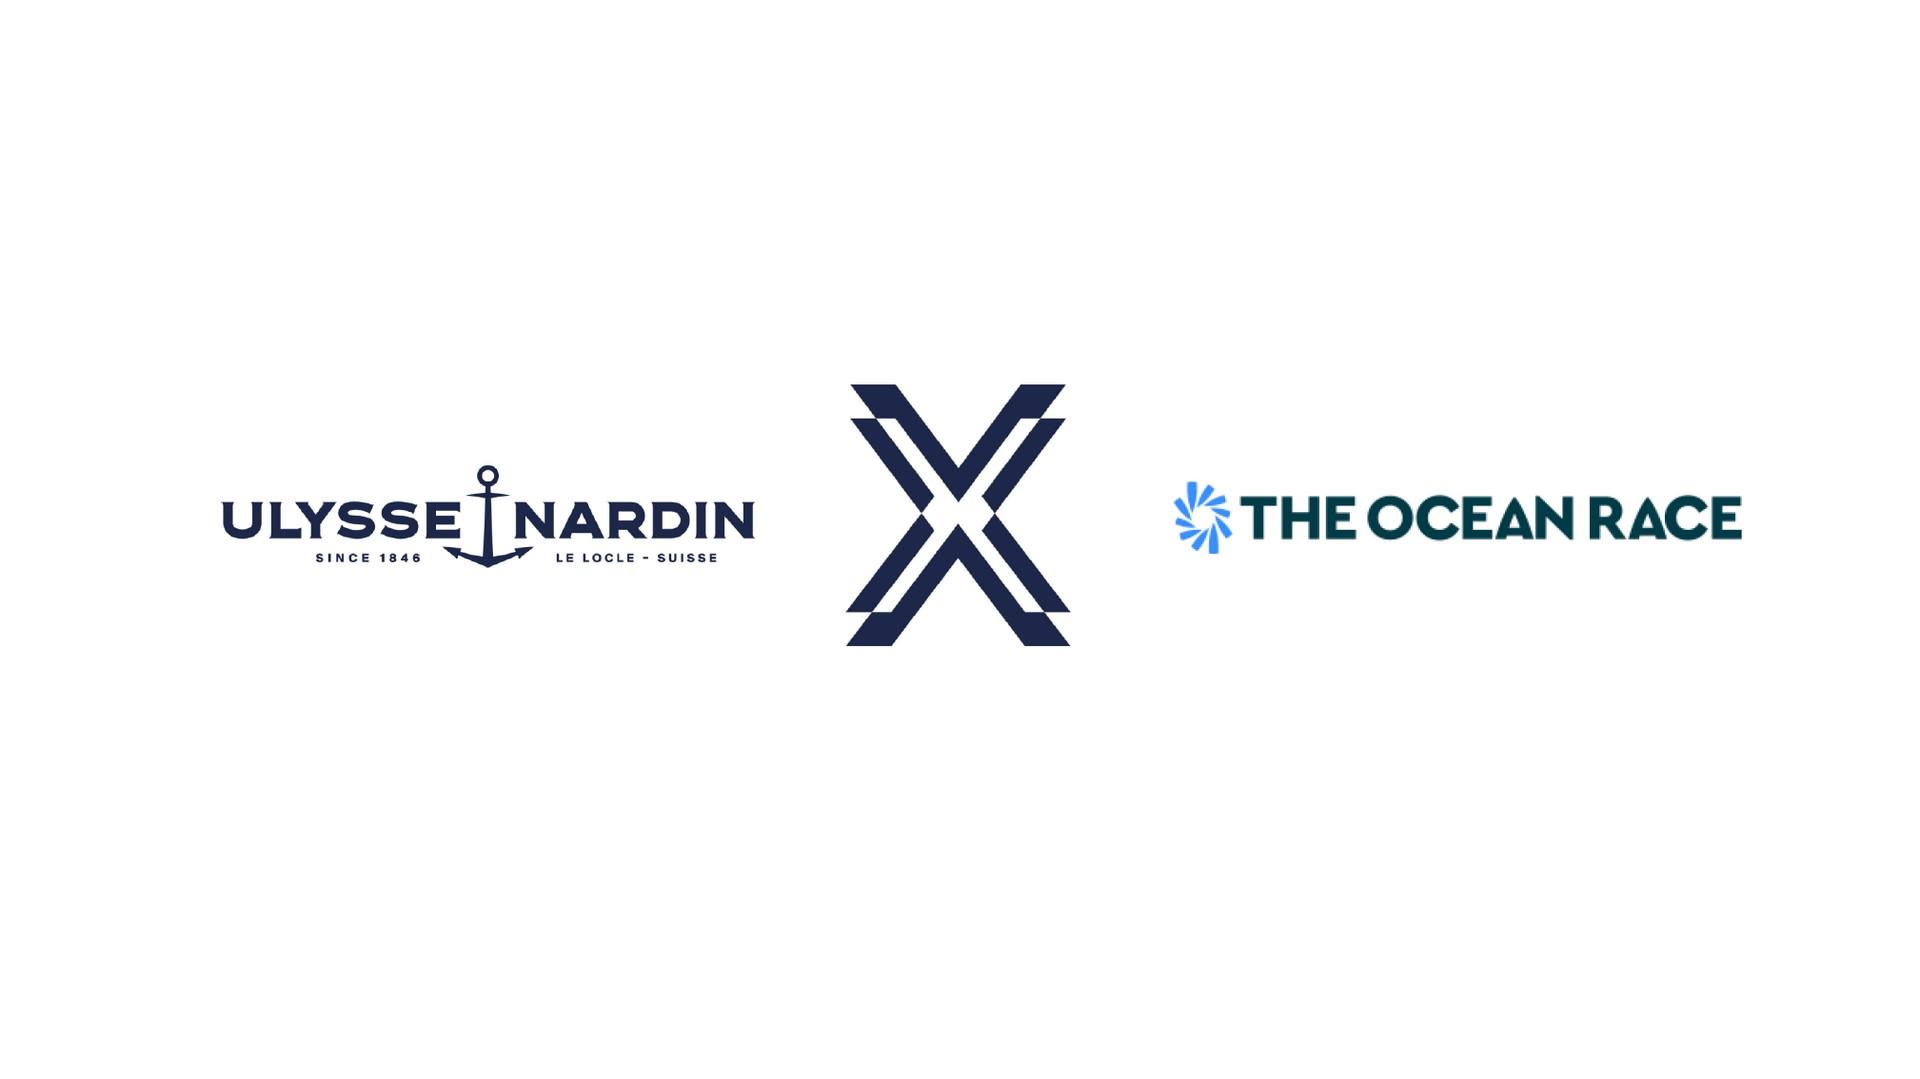 Ulysse Nardin x The Ocean Race (voile) 2021